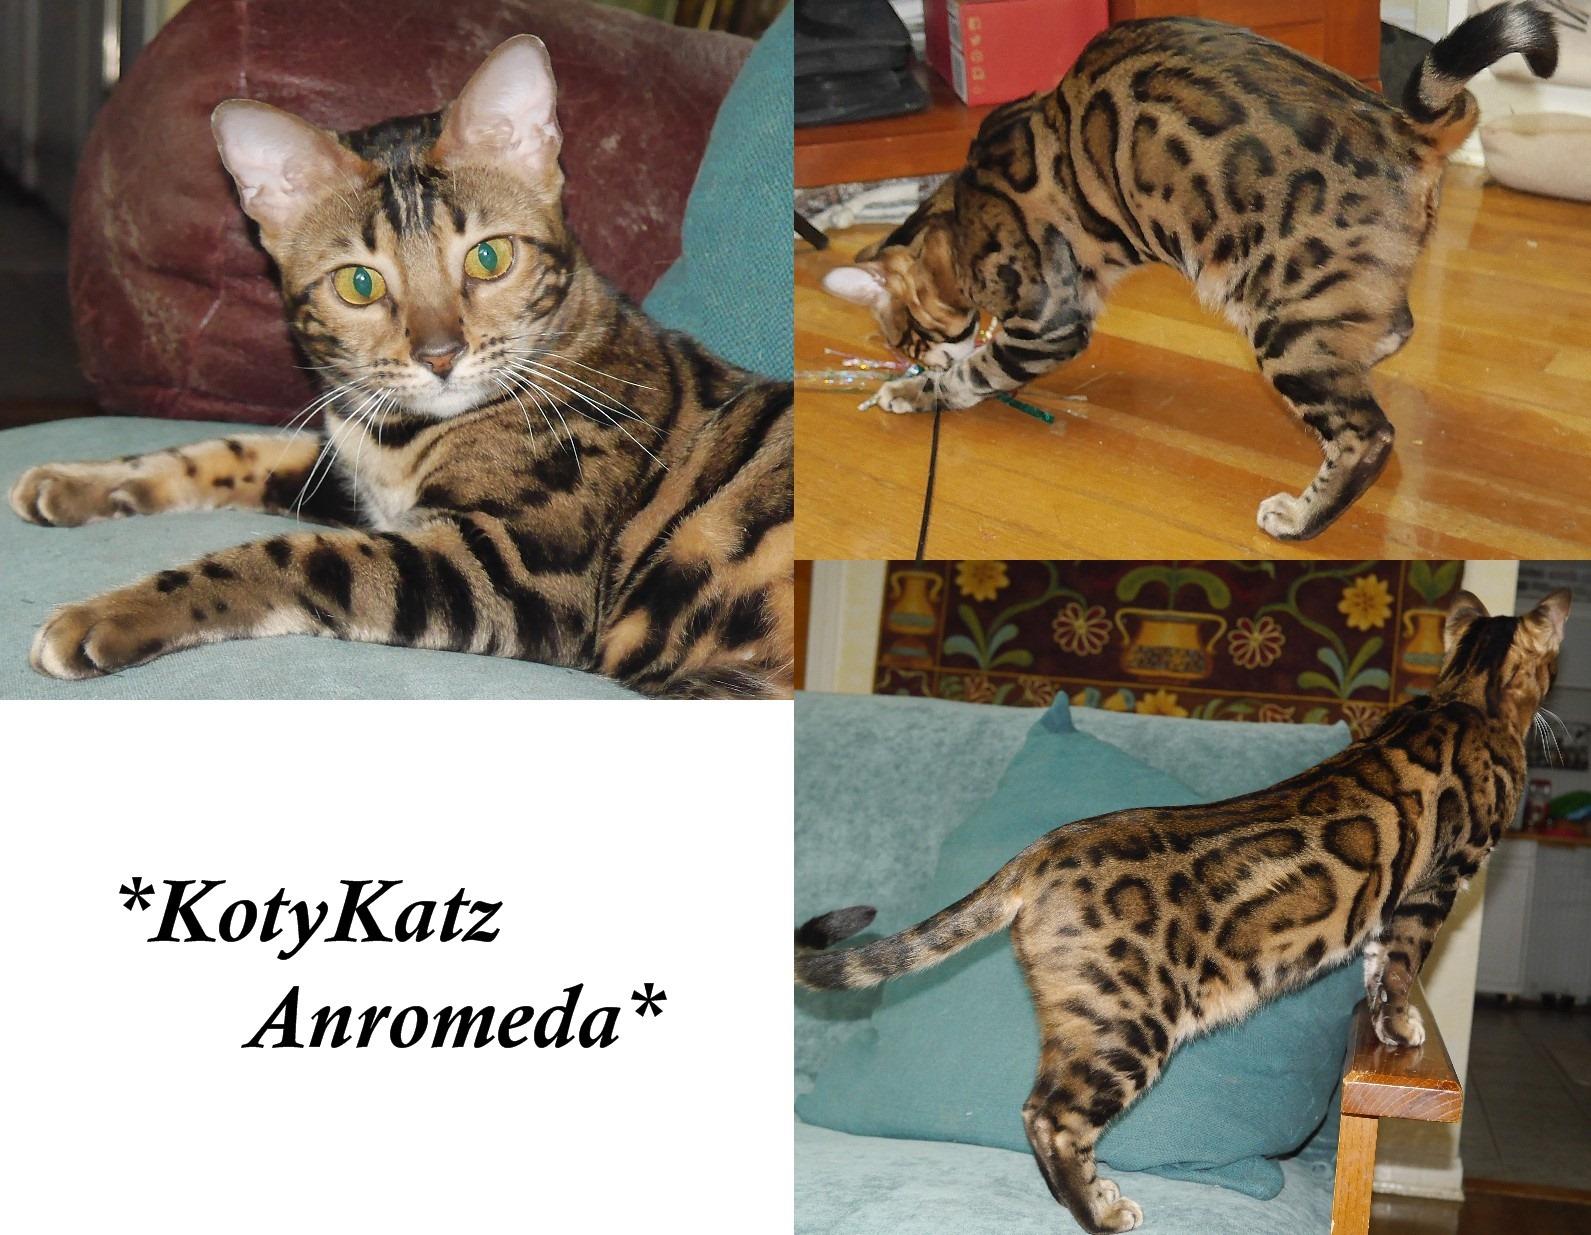 KotyKatz Anromeda